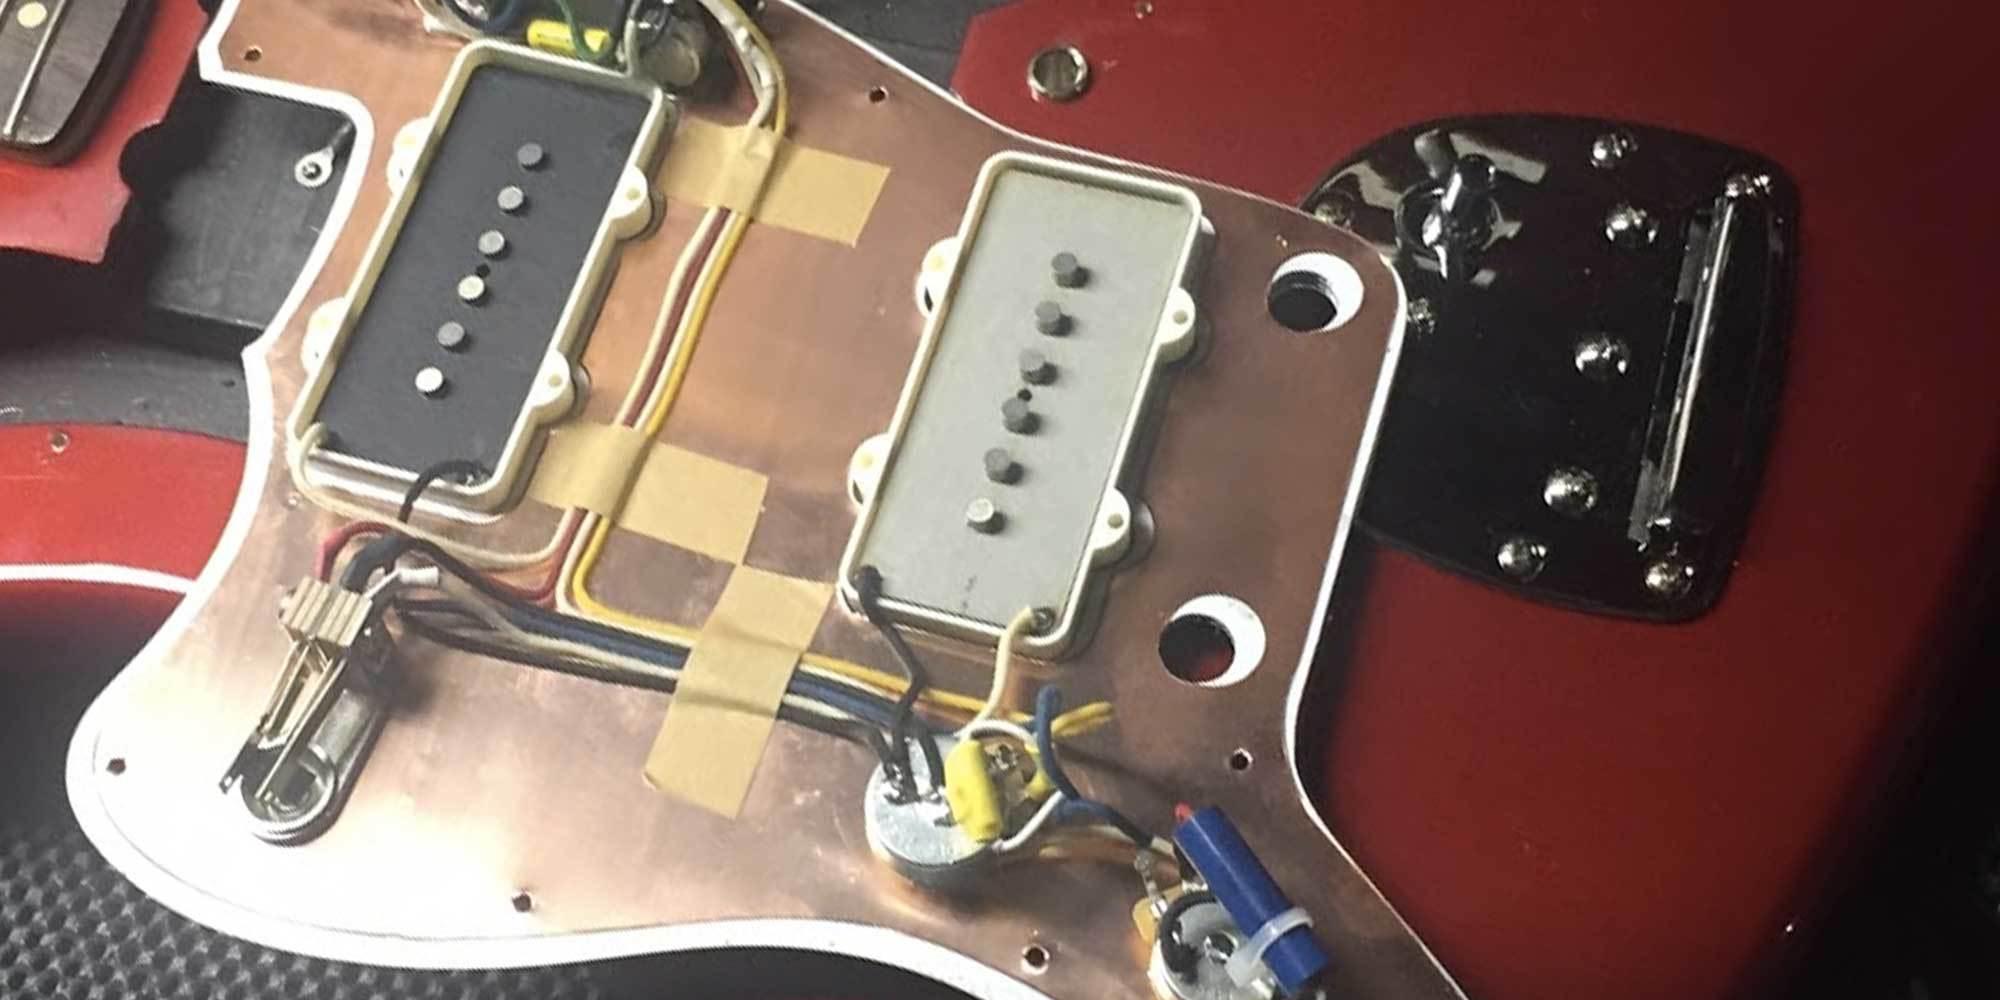 wiring diagram for fender stratocaster pickups ford focus serpentine belt upgrading jazzmaster electronics: unleash the potential | reverb news